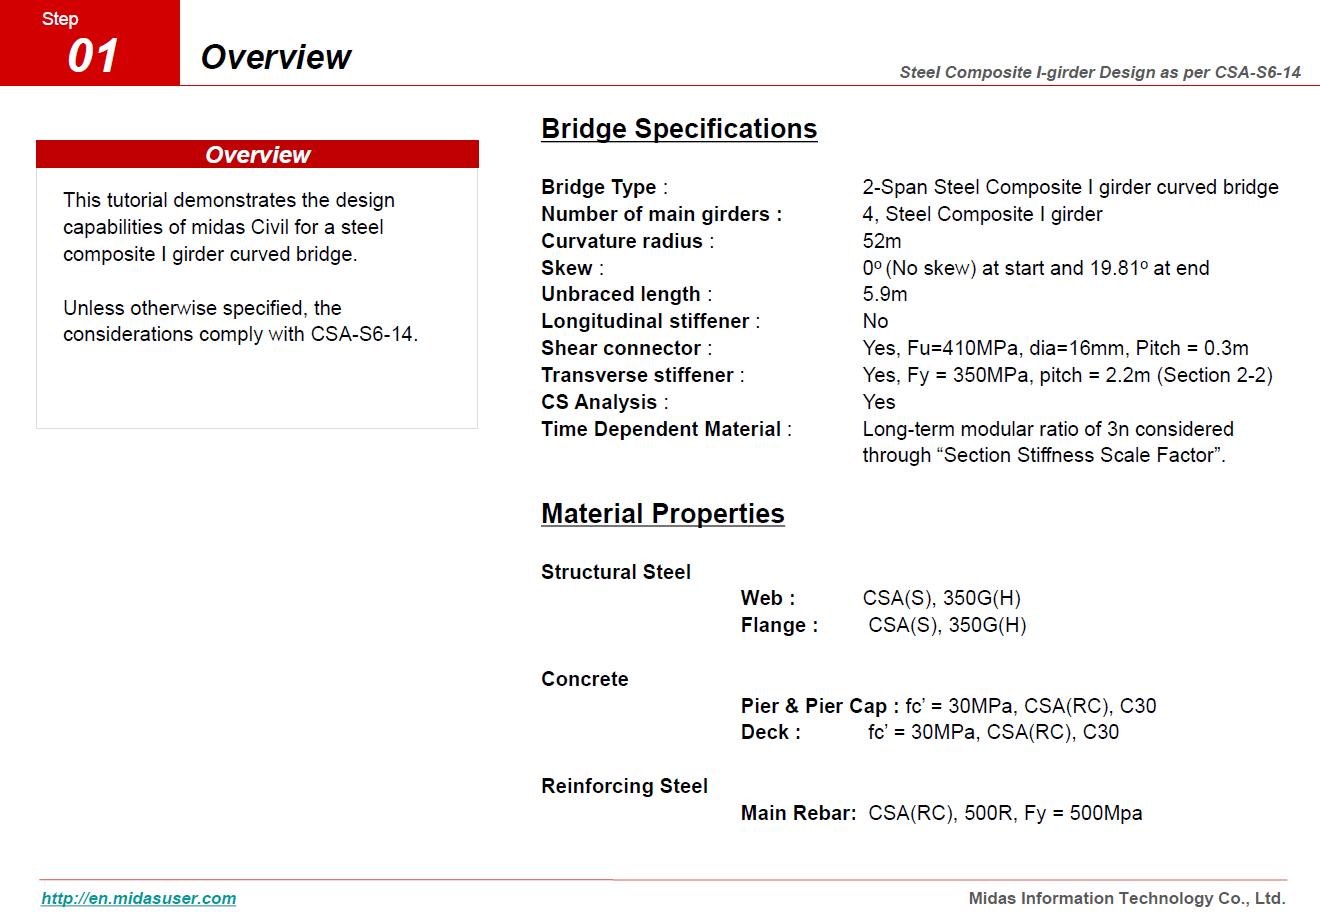 CHBDC CSA S6-14 Steel Composite Bridge Design